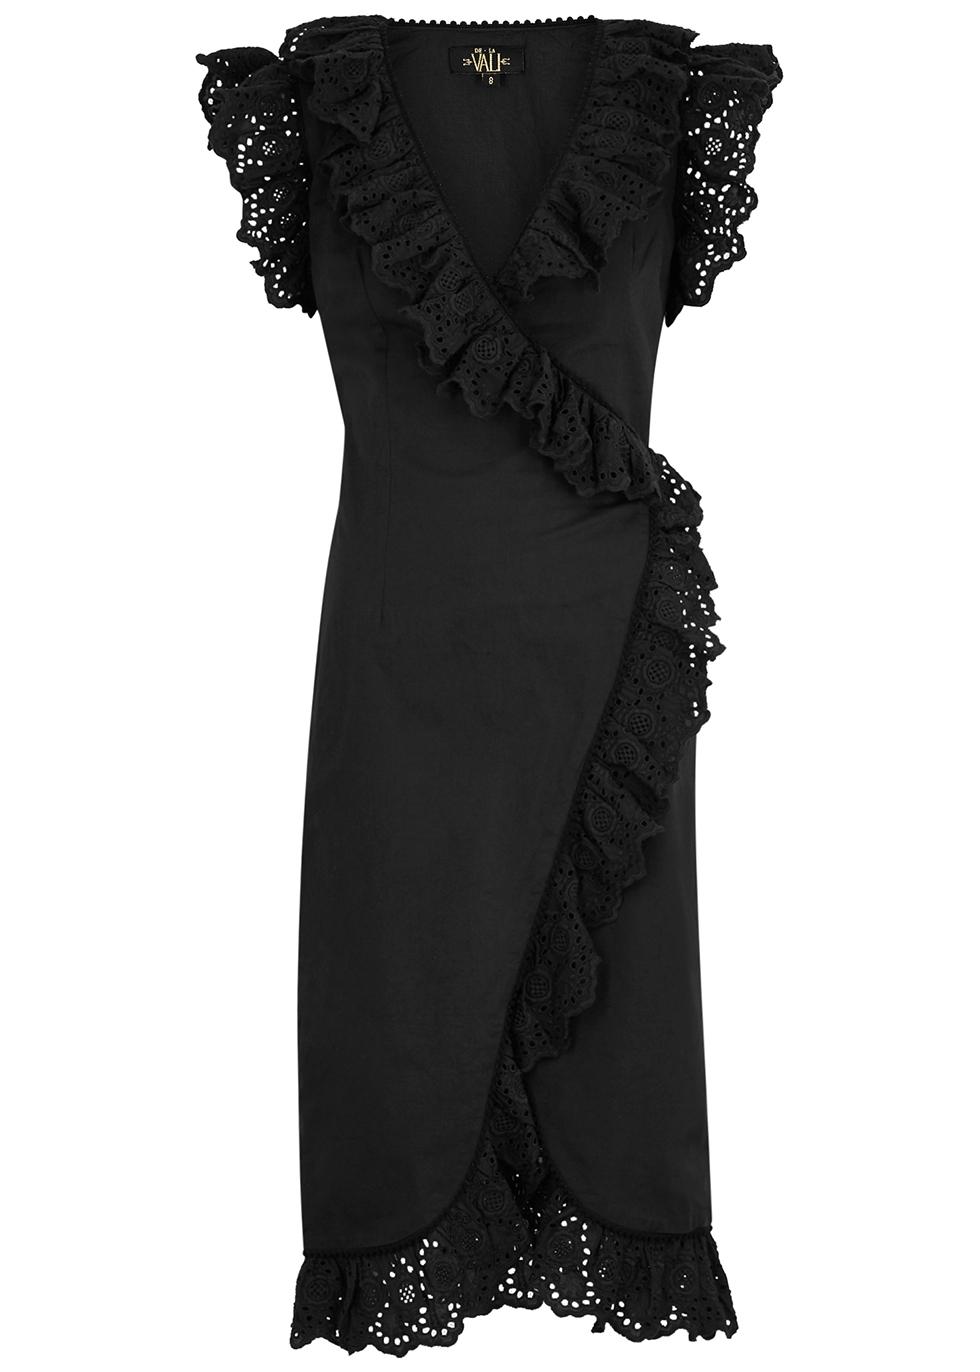 Cadaques ruffled-trimmed cotton wrap dress